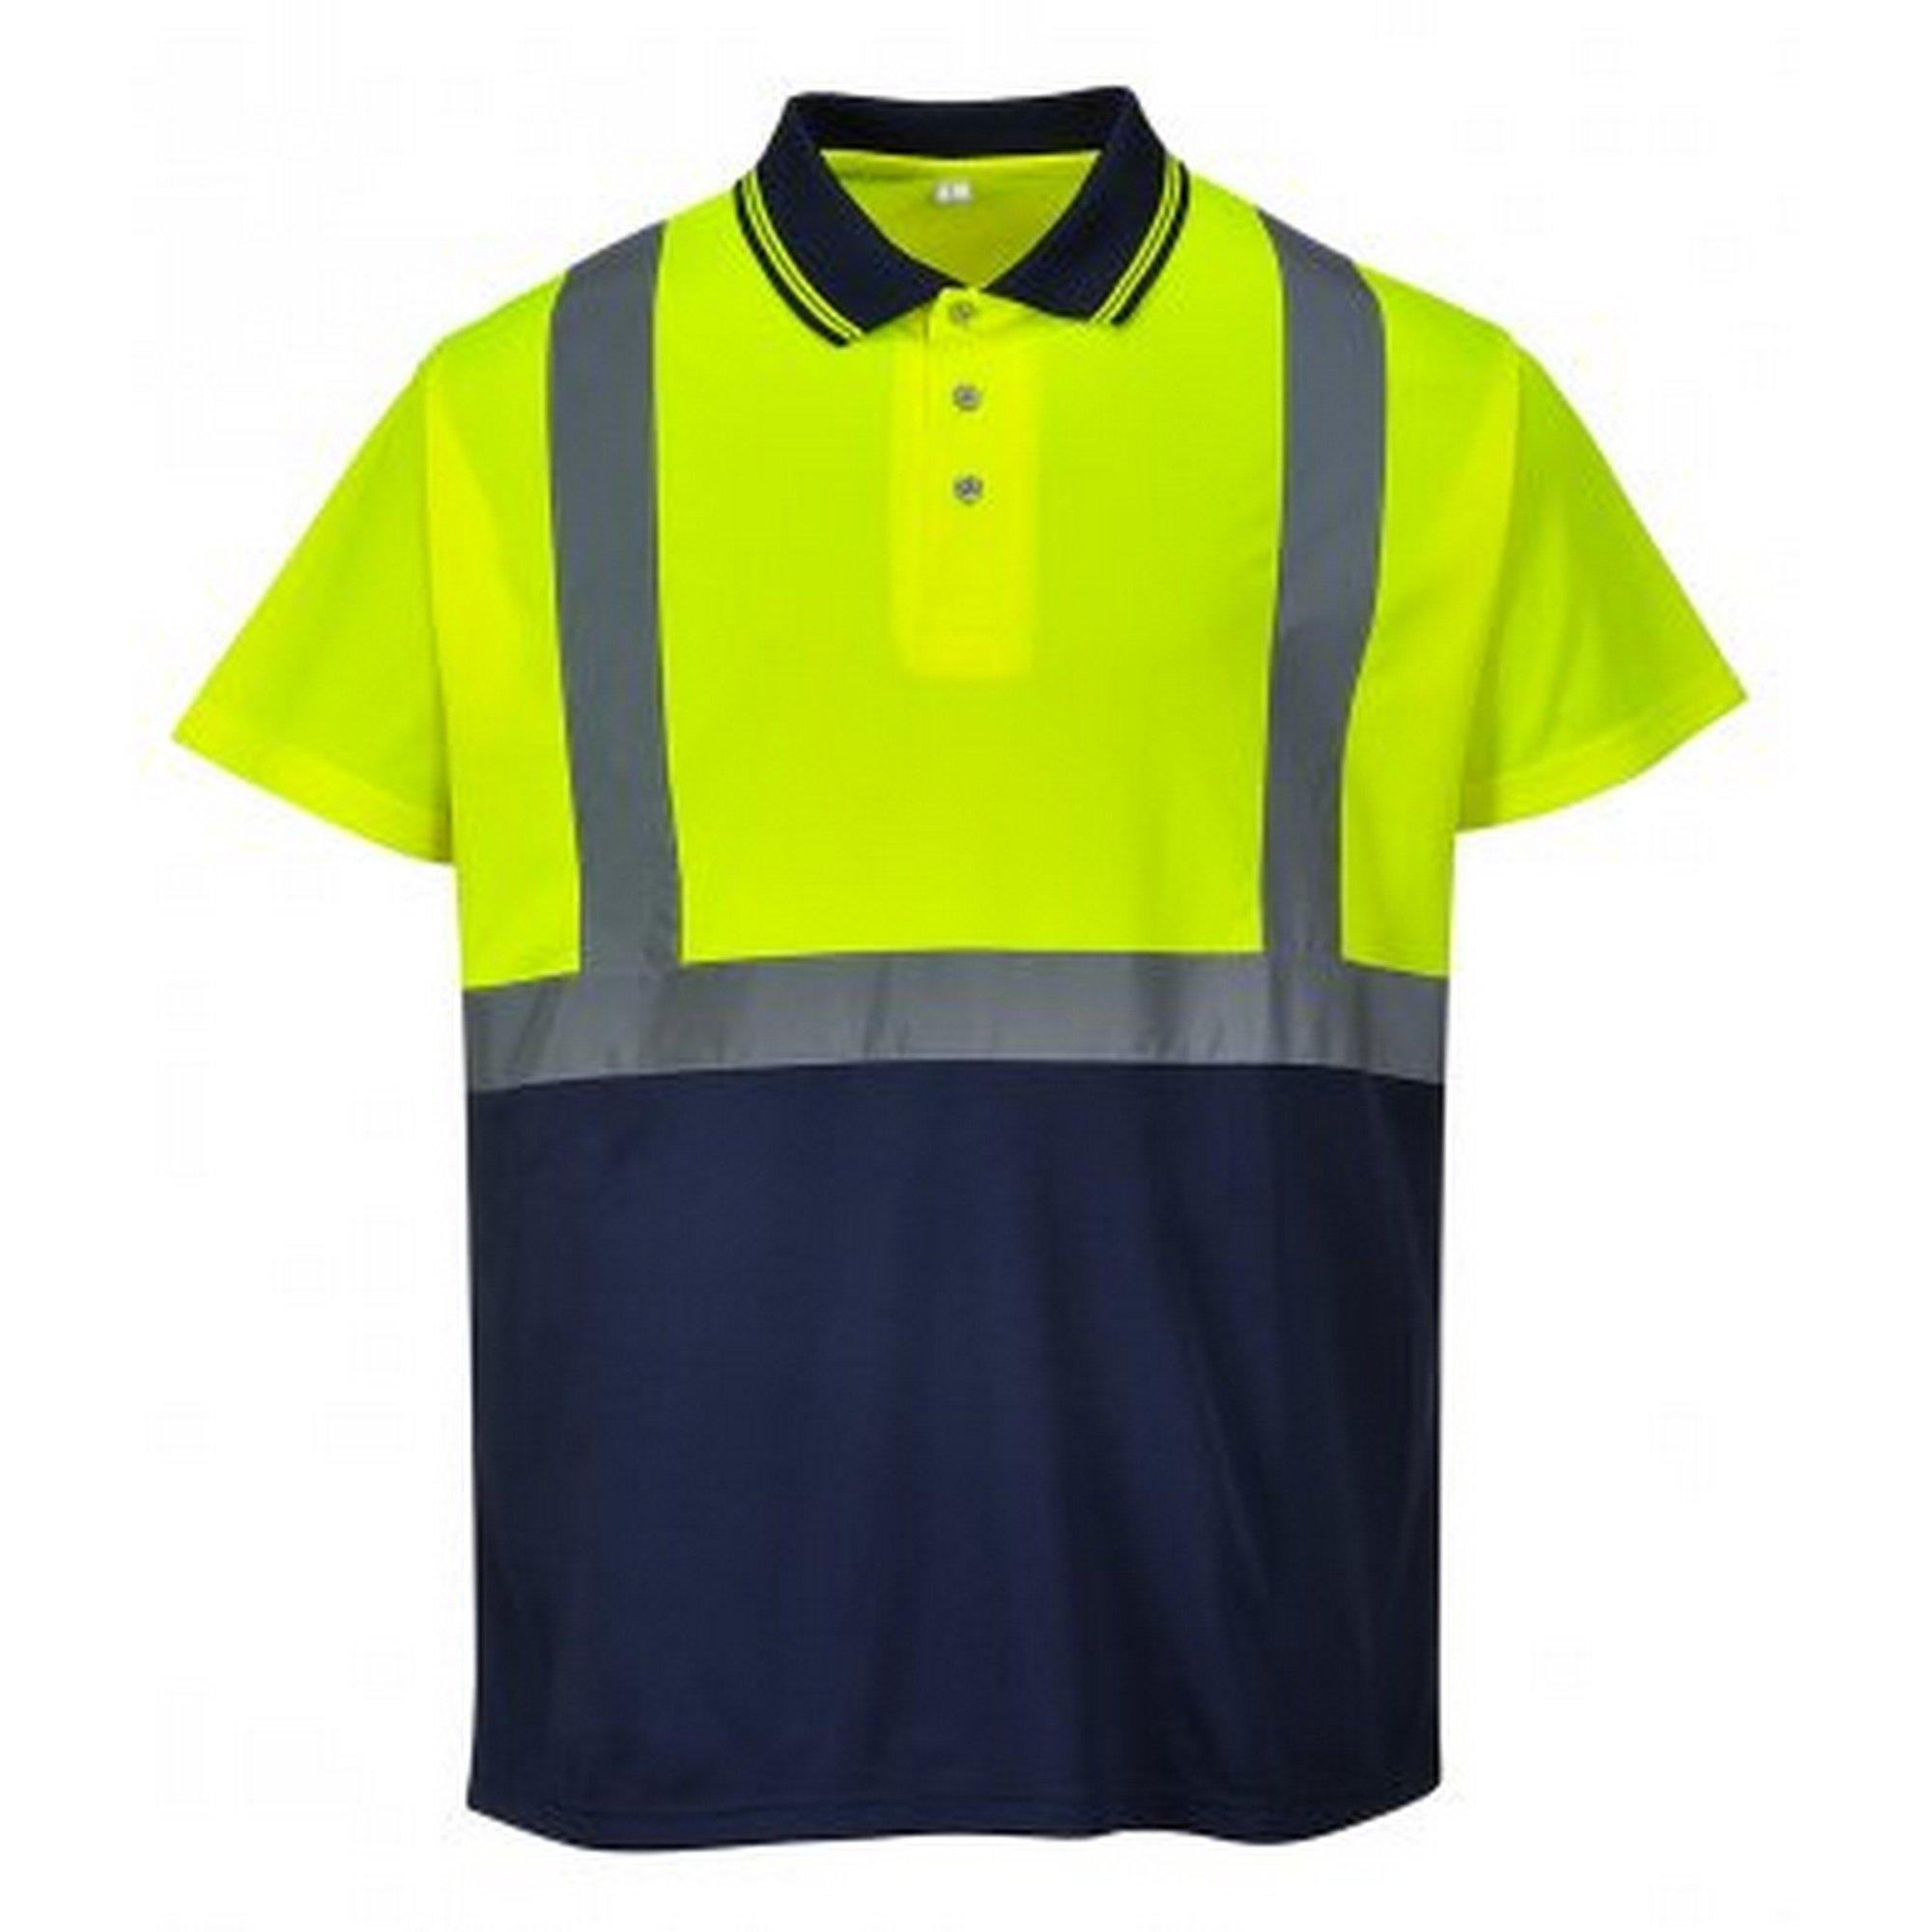 Portwest Mens Hi-Vis Two Tone Polo Shirt (L) (Yellow/Navy)